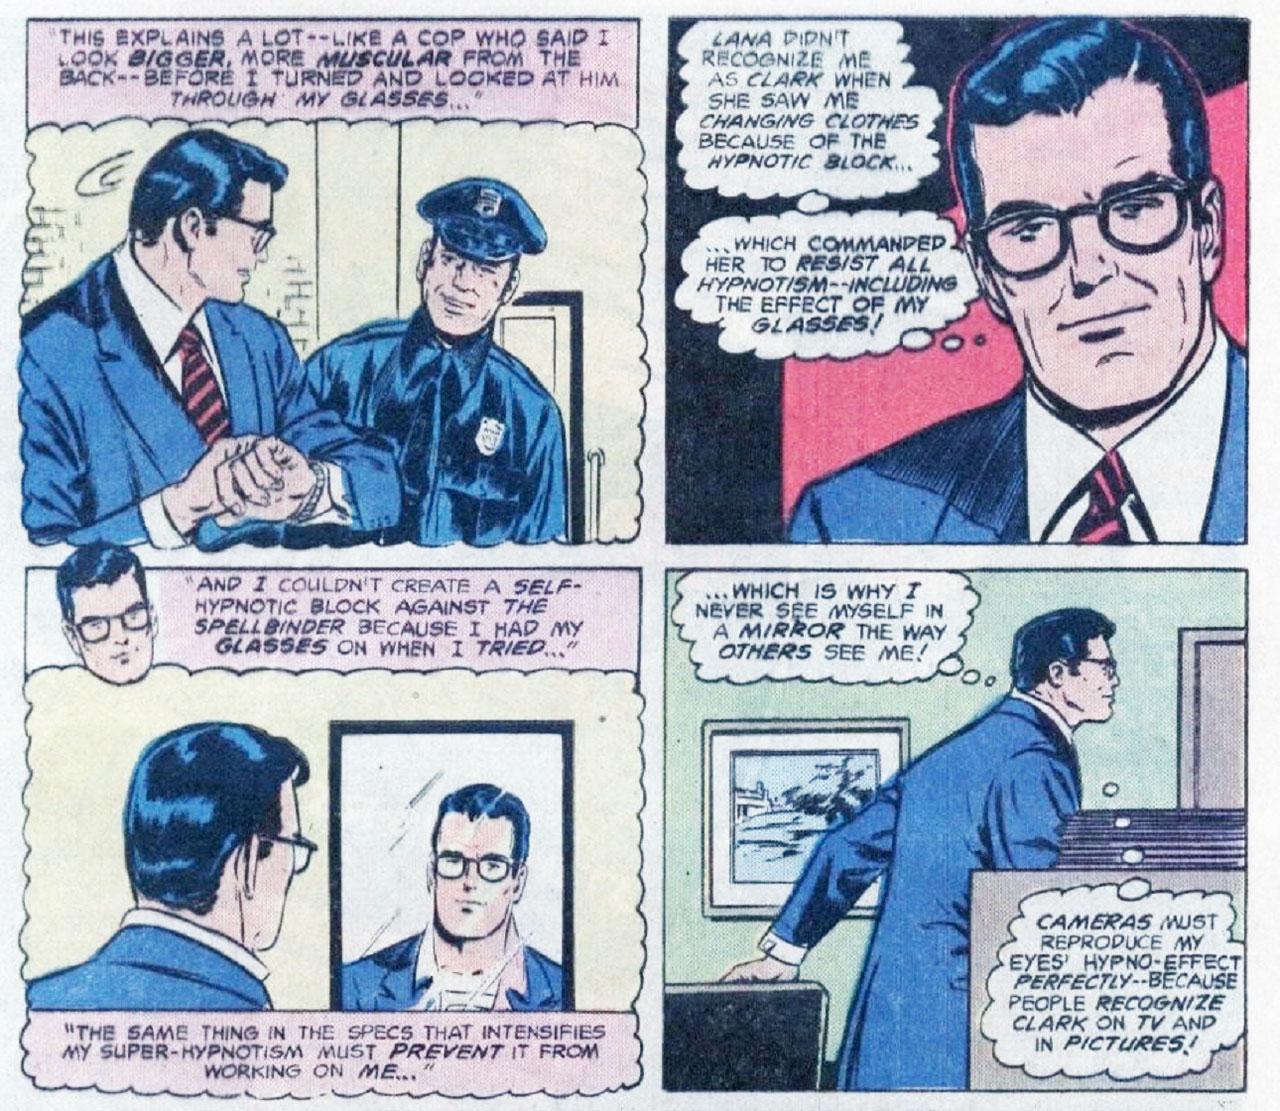 superman-glasses-secret-identity-vision.JPG